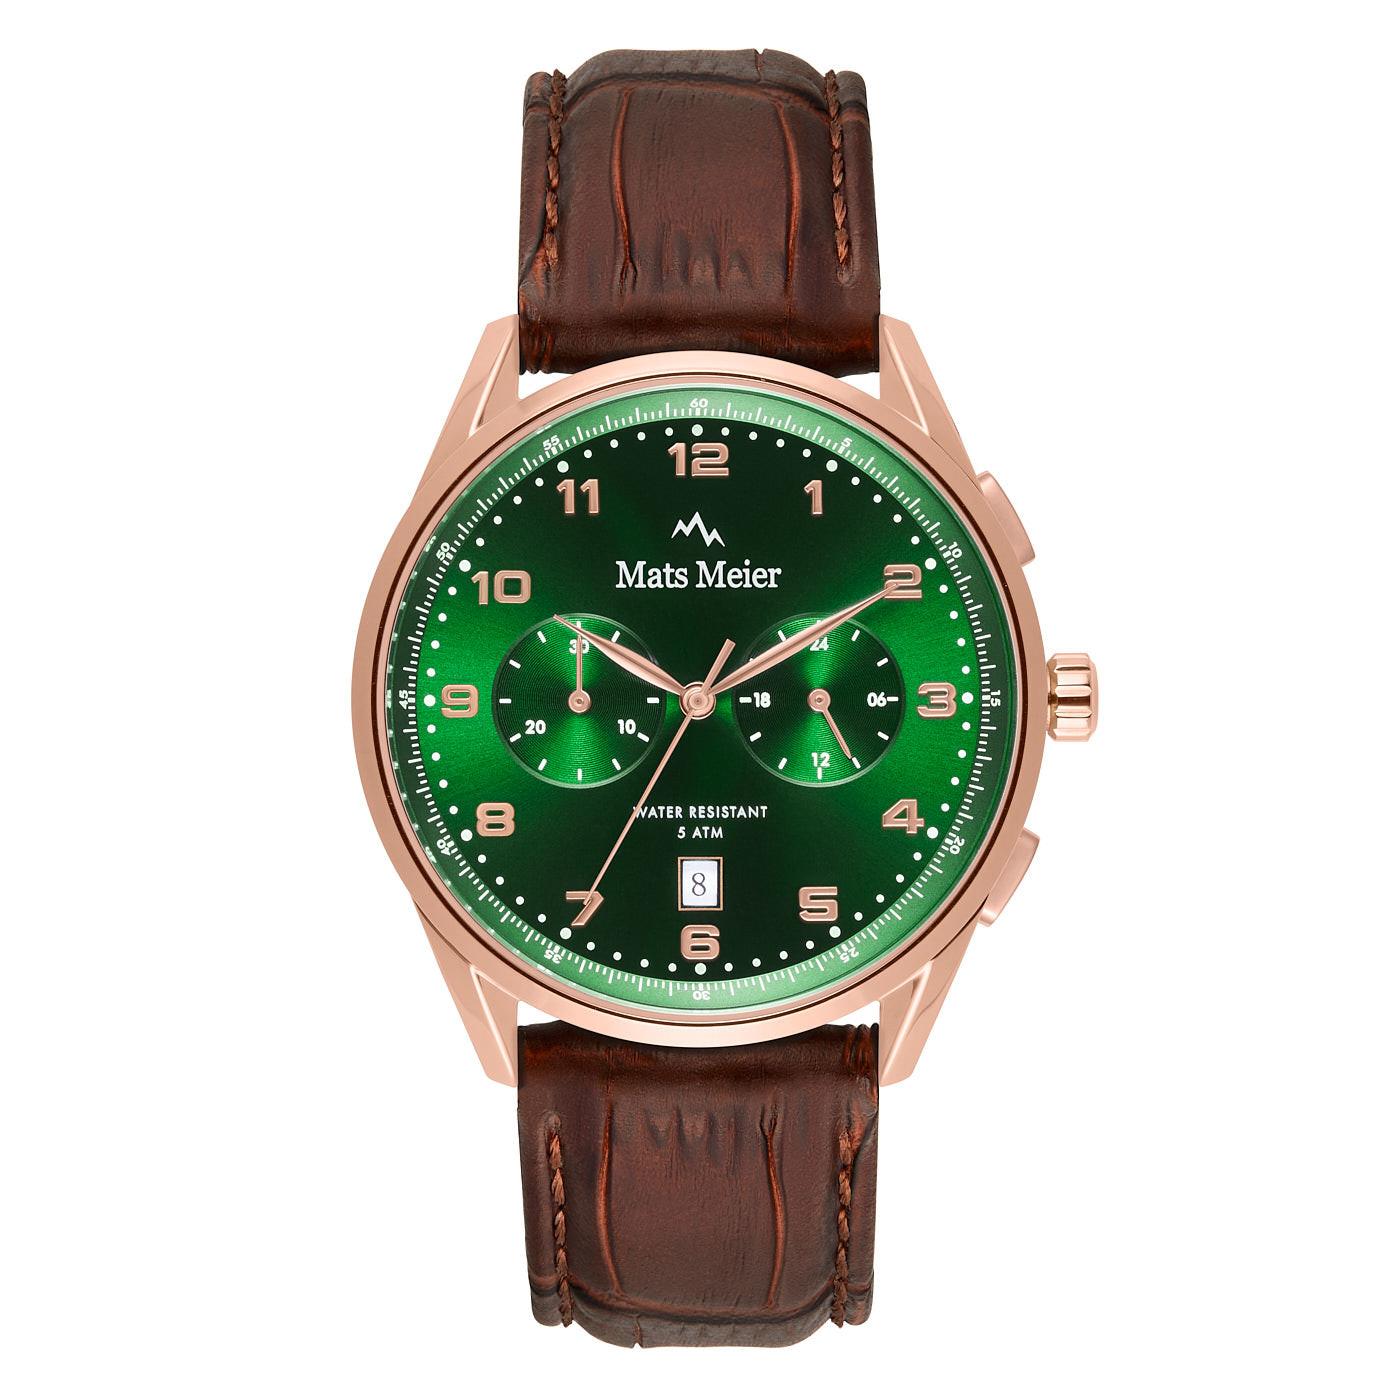 Mats Meier Mont Vélan montre chronographe vert / rosé / marron